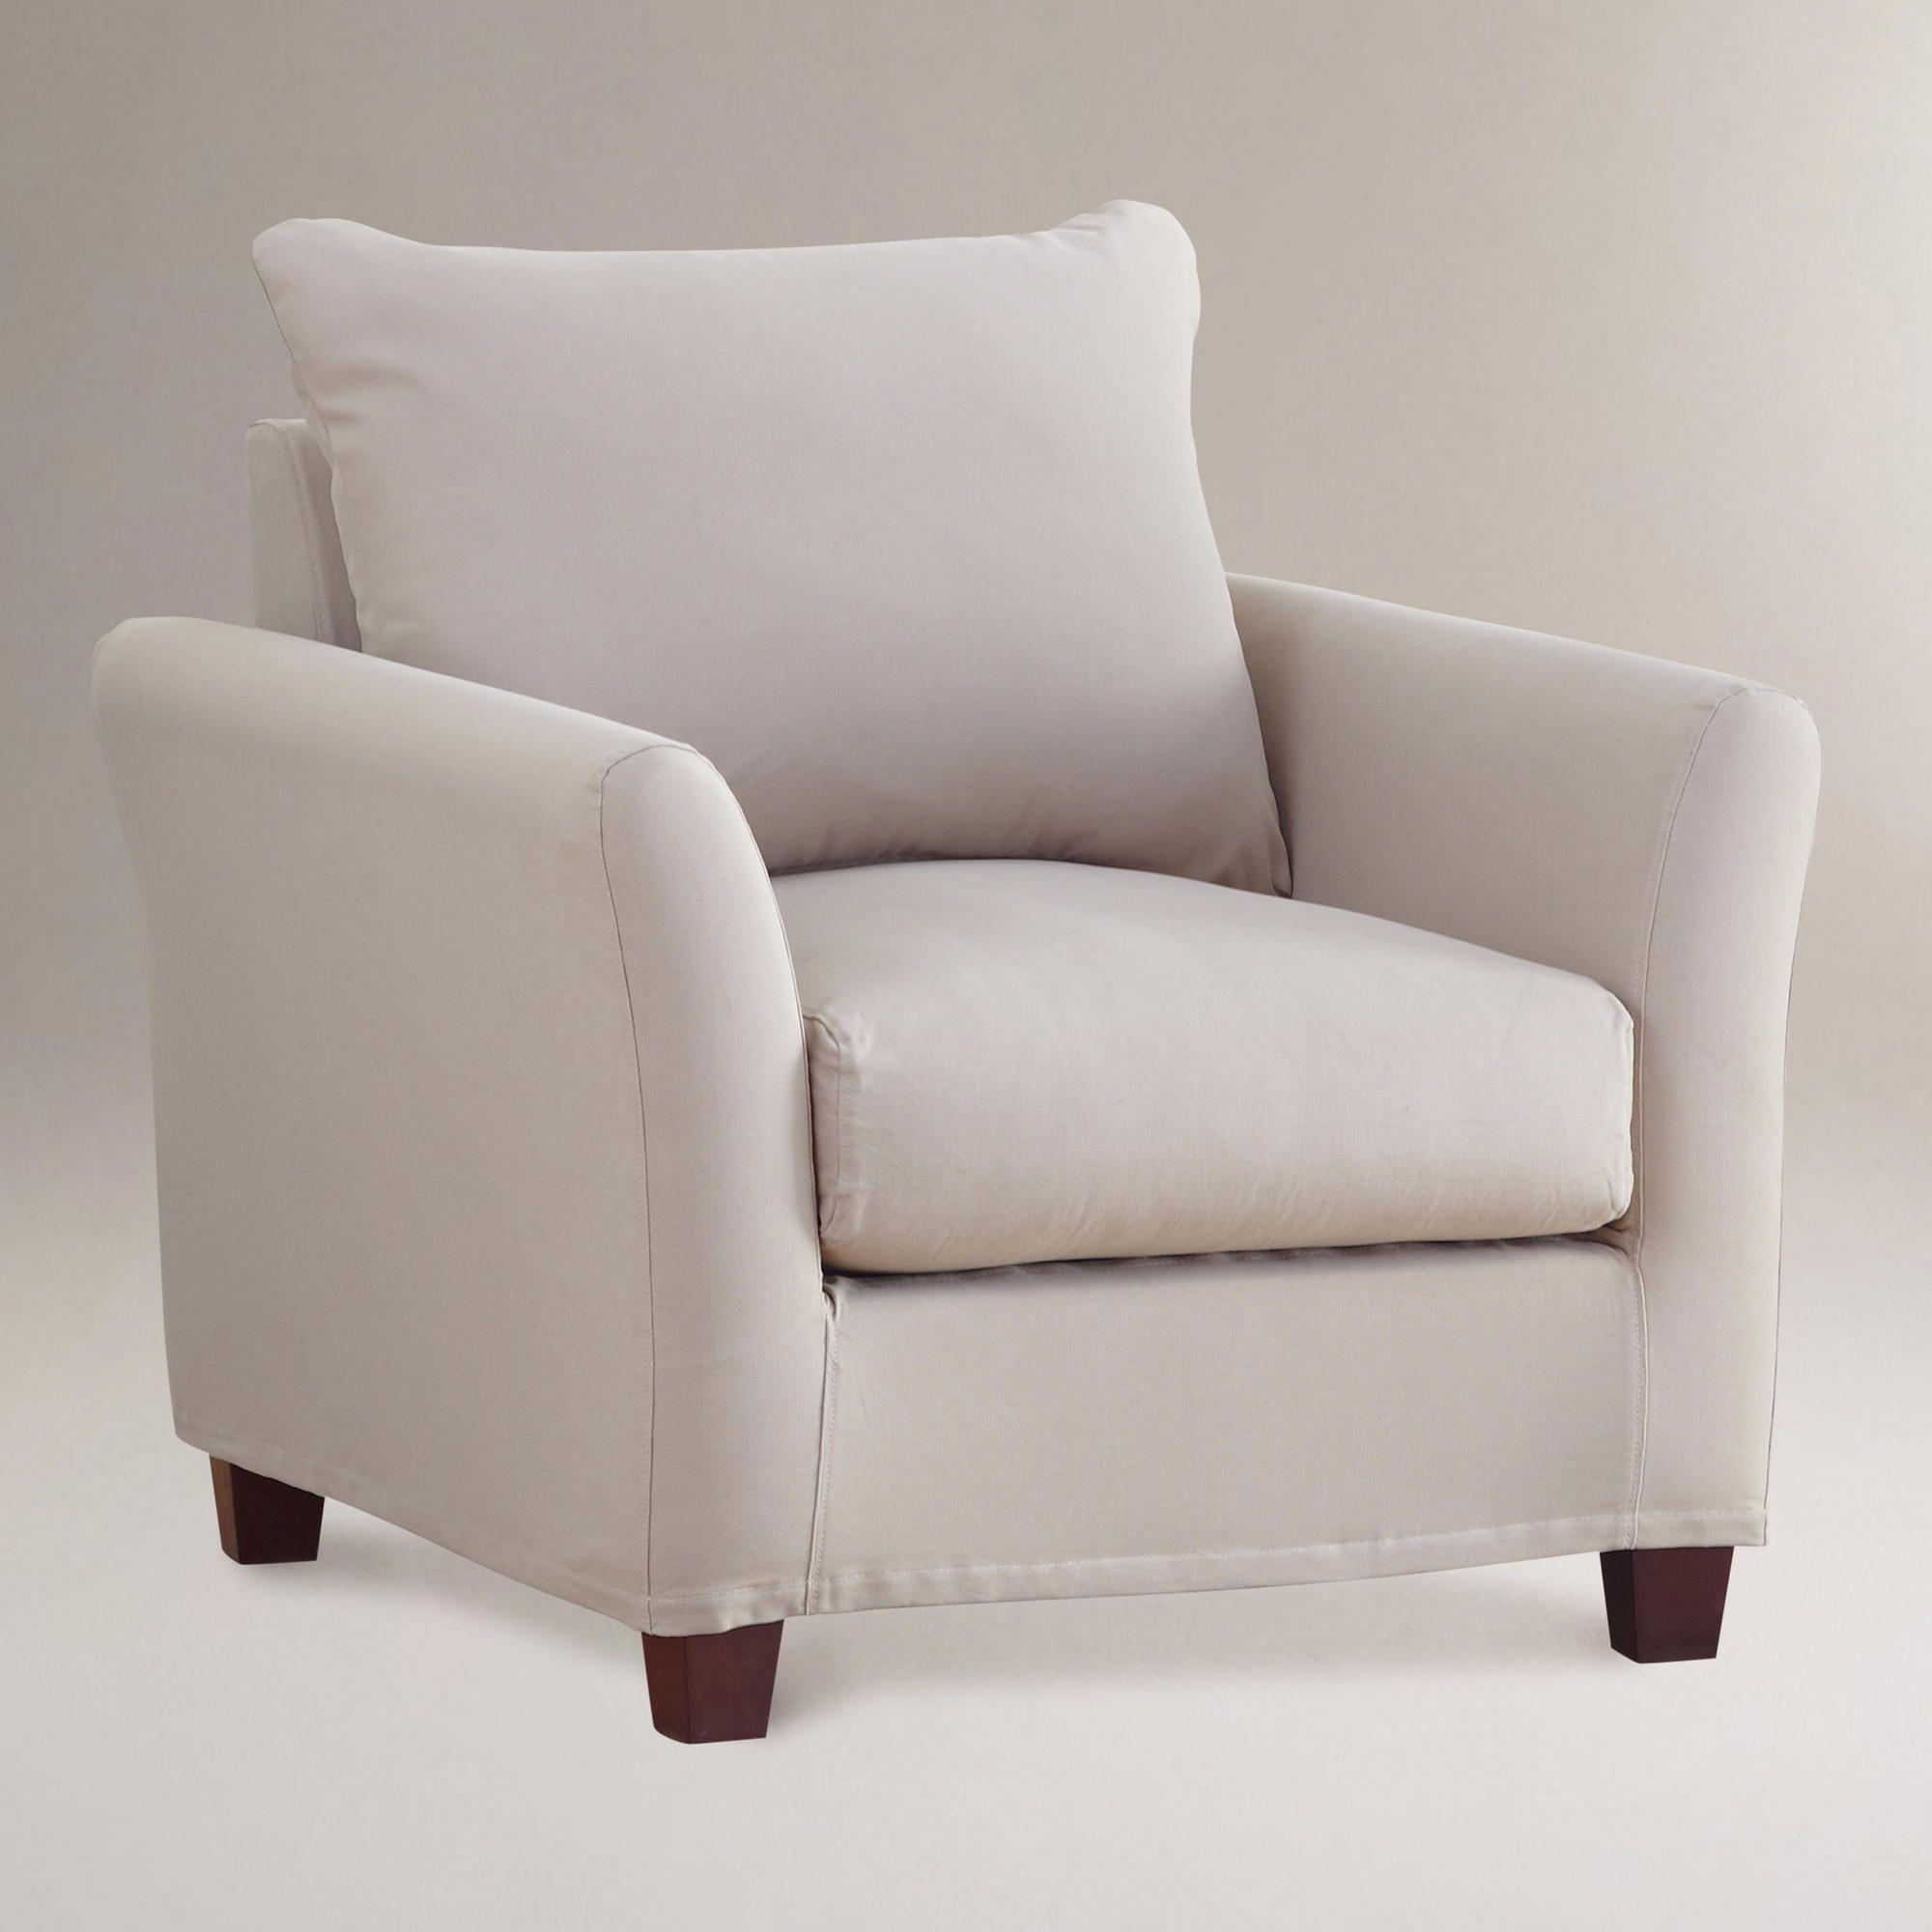 Luxe chair slipcover khaki luxe chair slipcover khaki world market